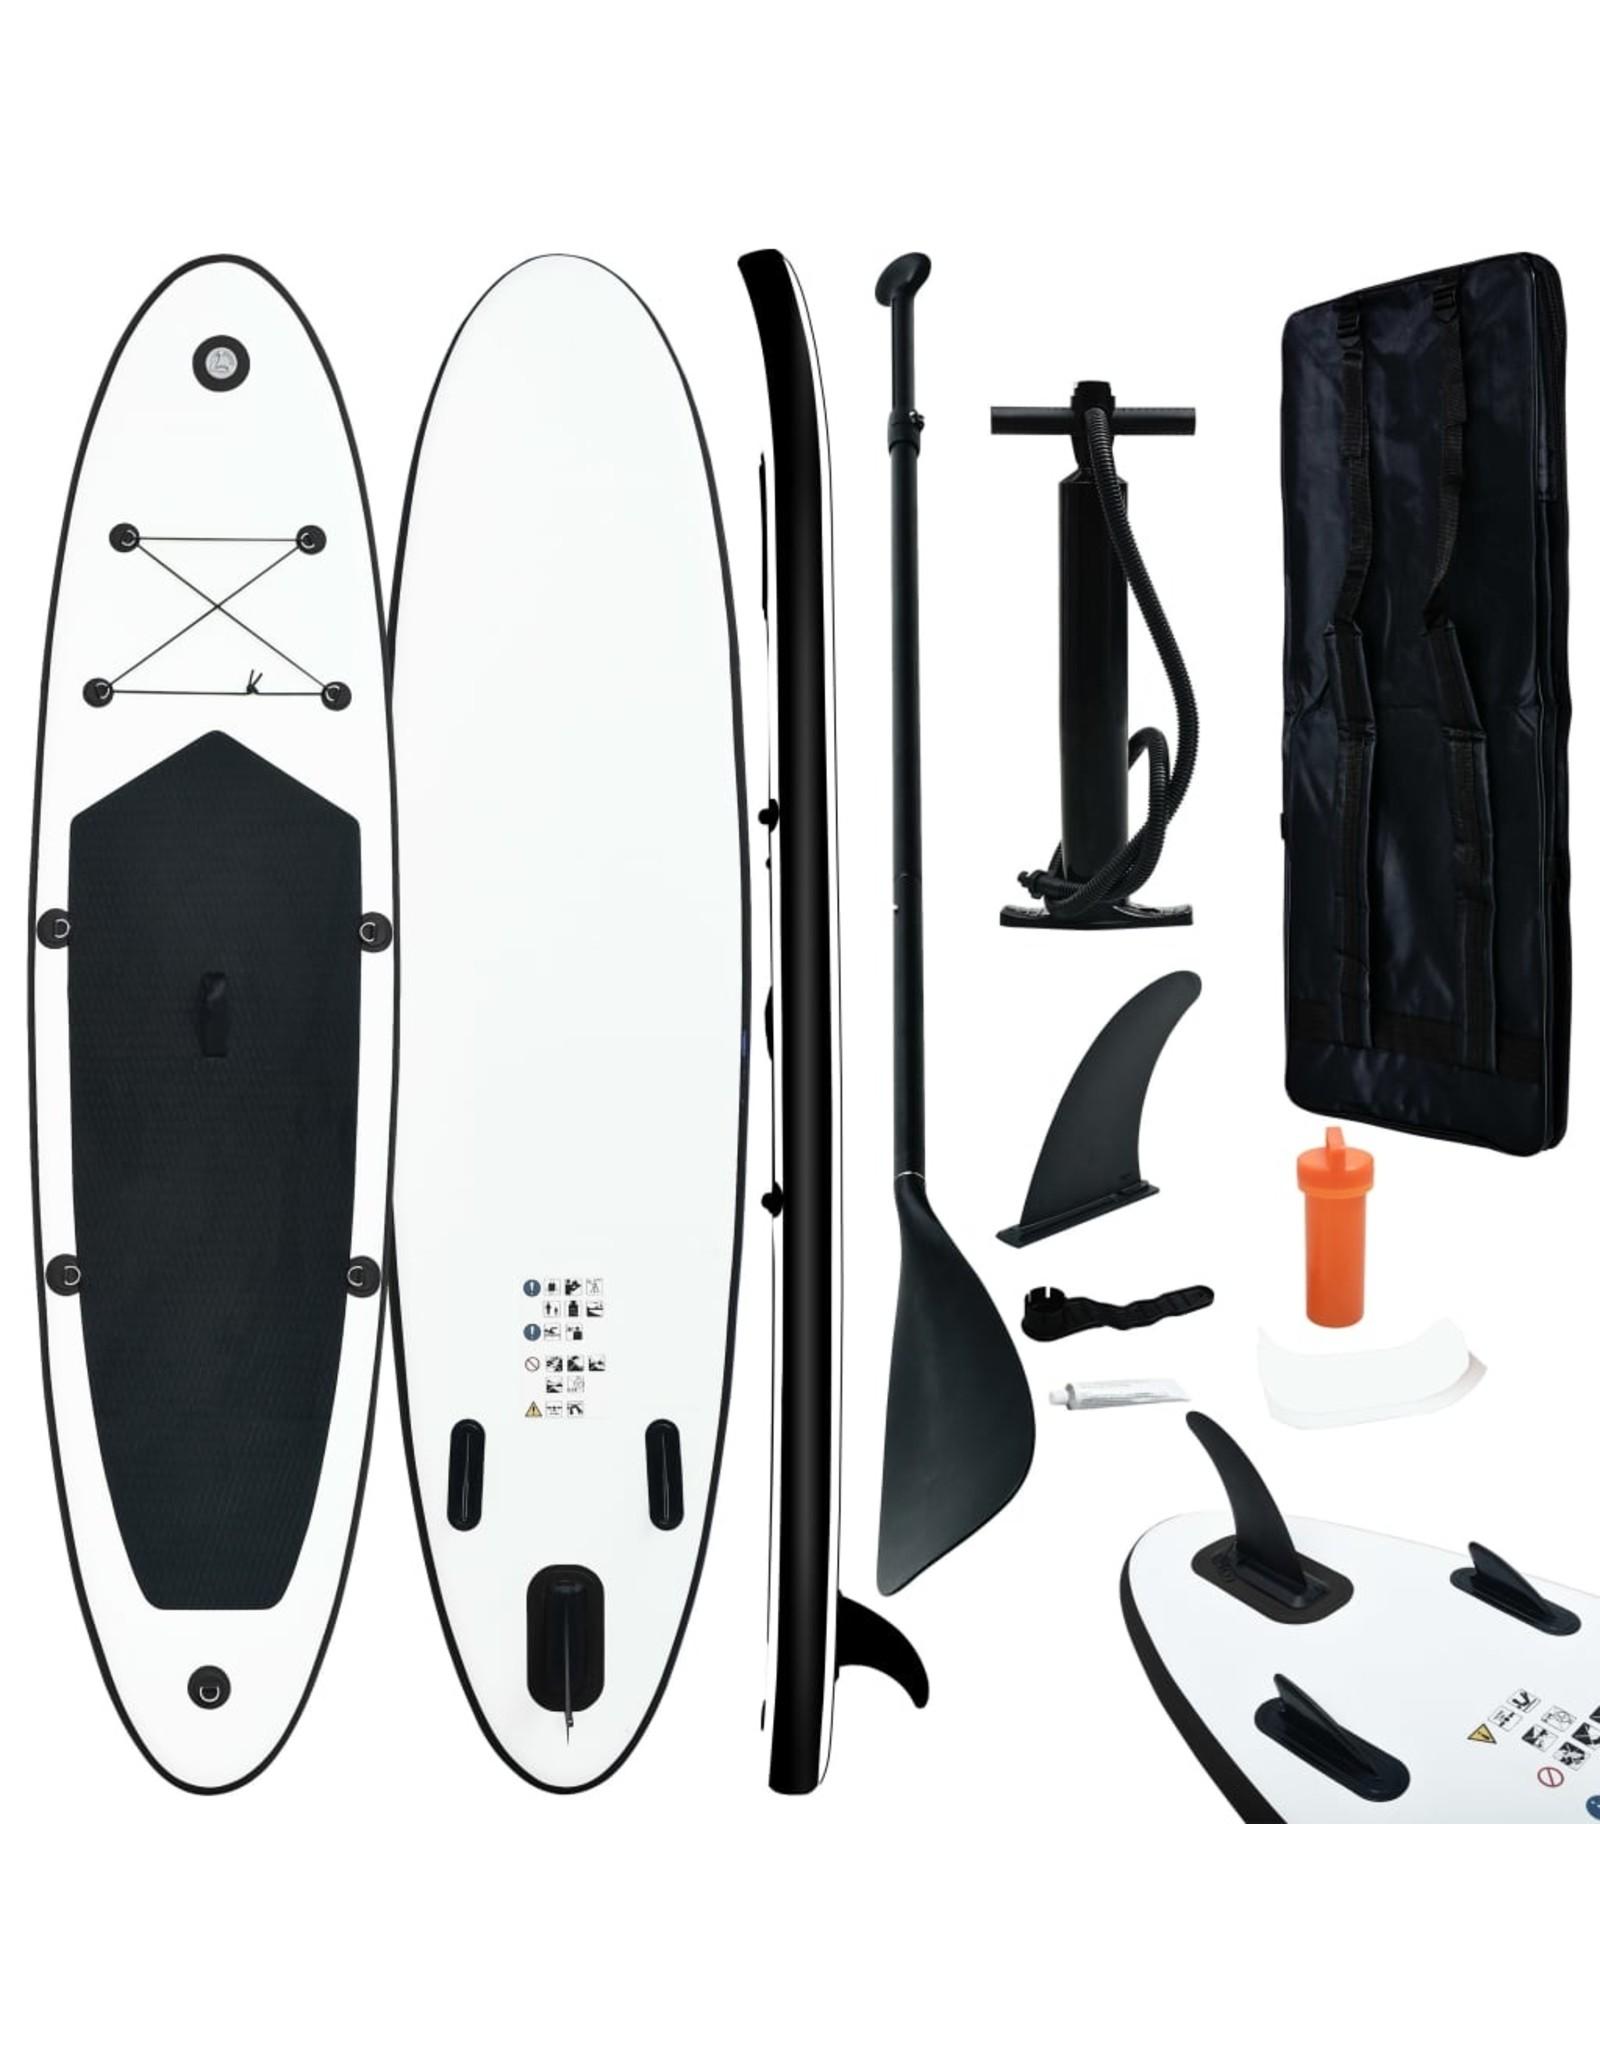 Stand Up Paddleboardset opblaasbaar zwart en wit